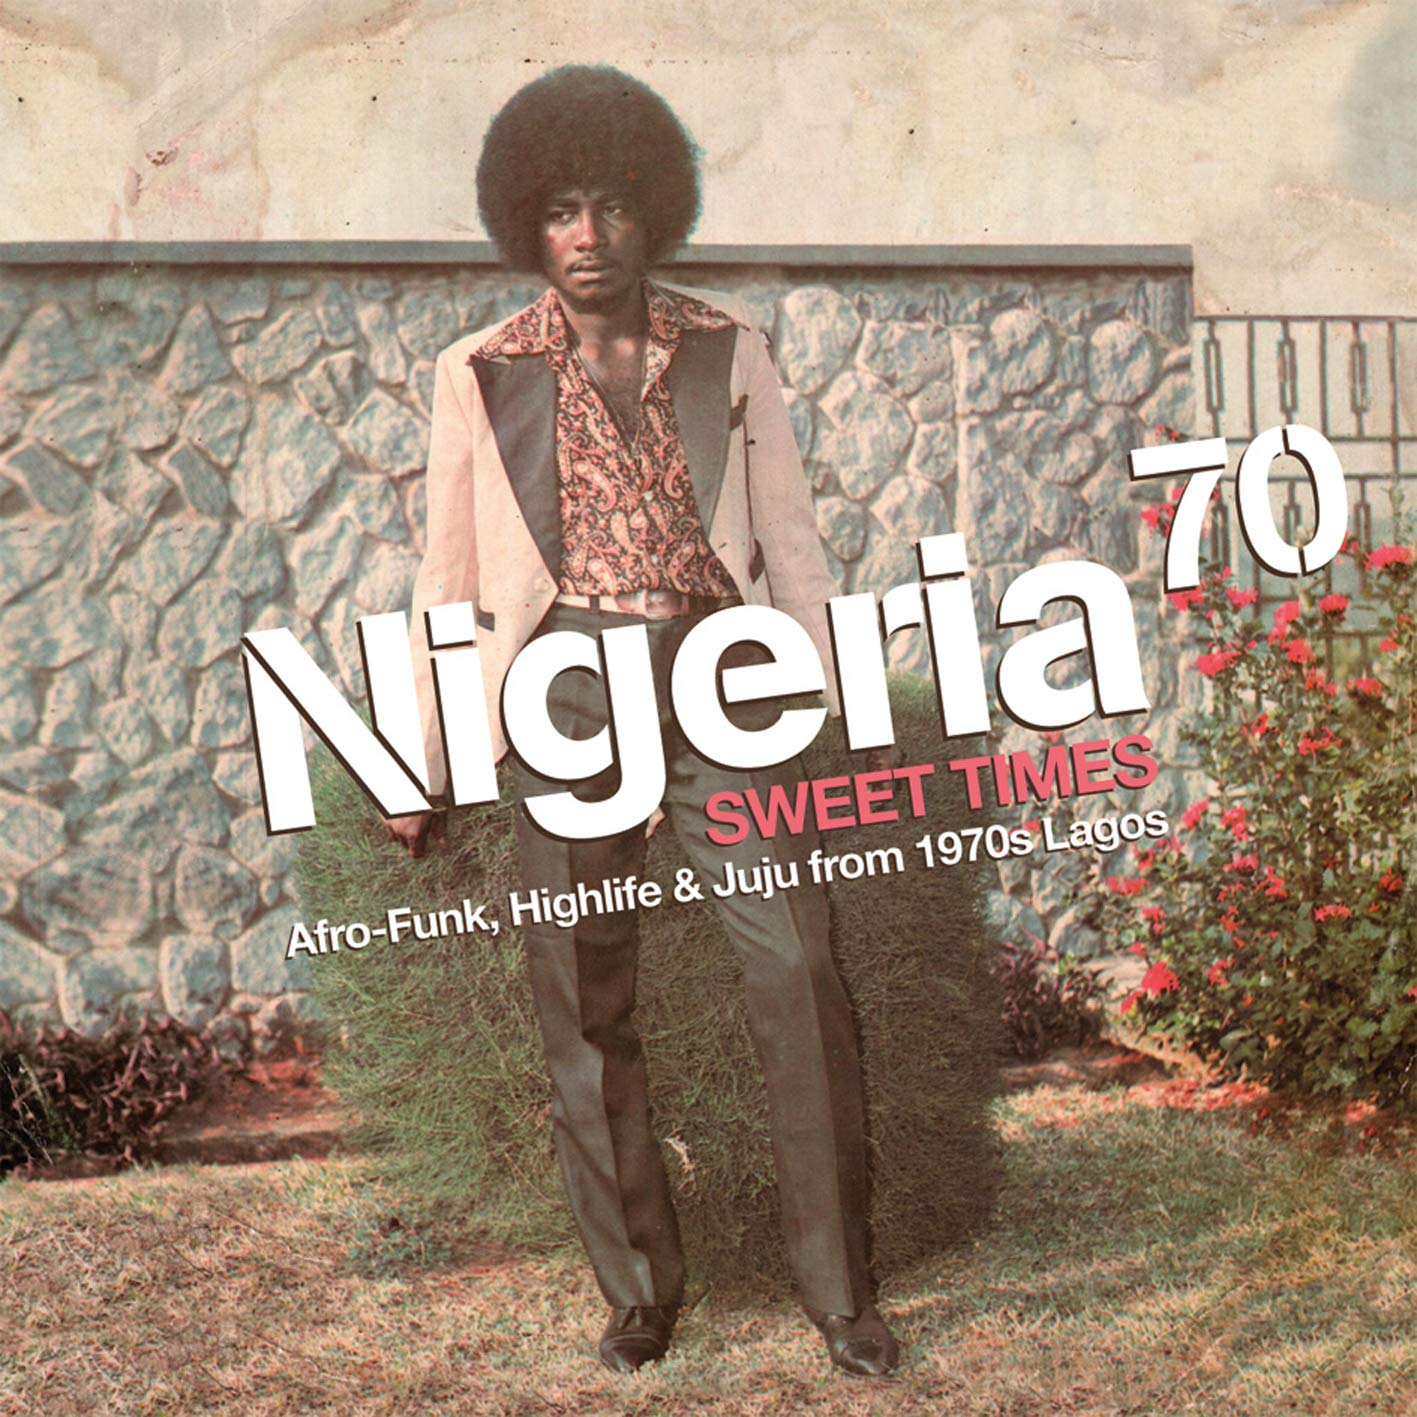 Nigeria 70: Sweet Times by Naiive